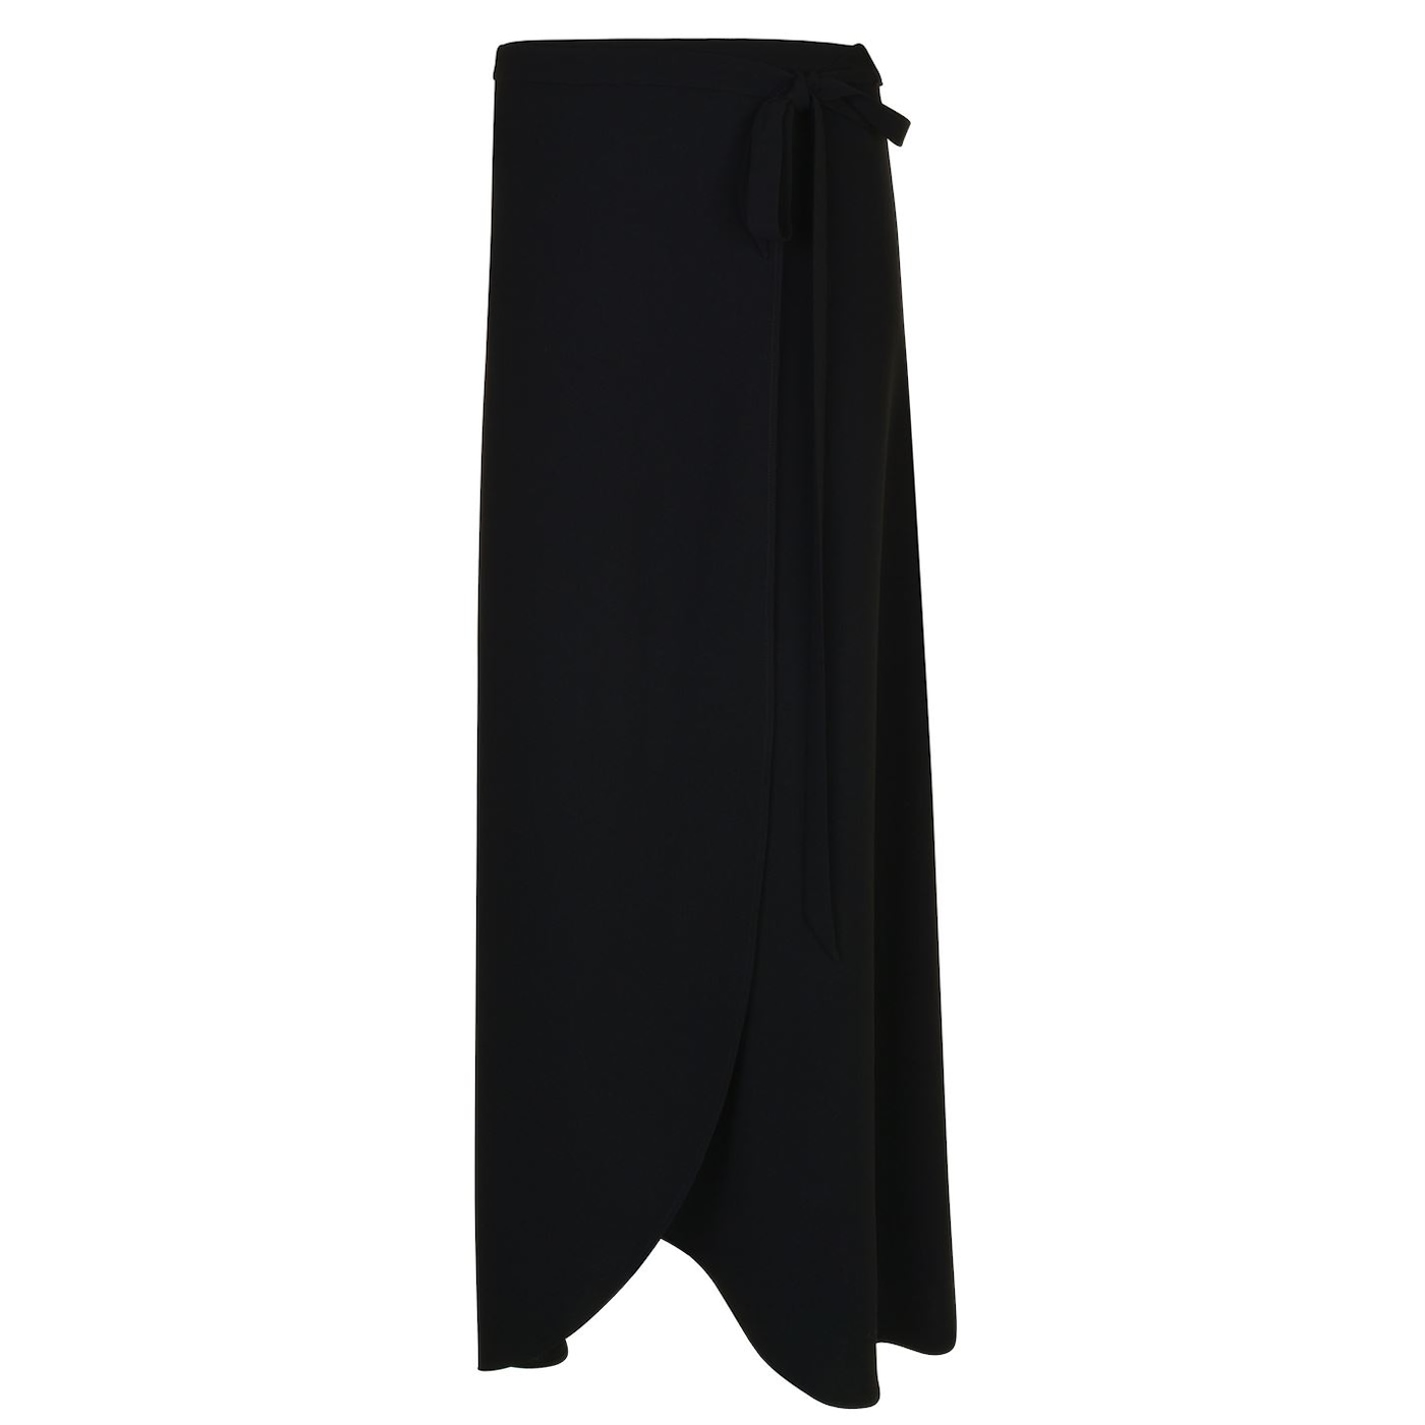 THEORY Amaning Skirt